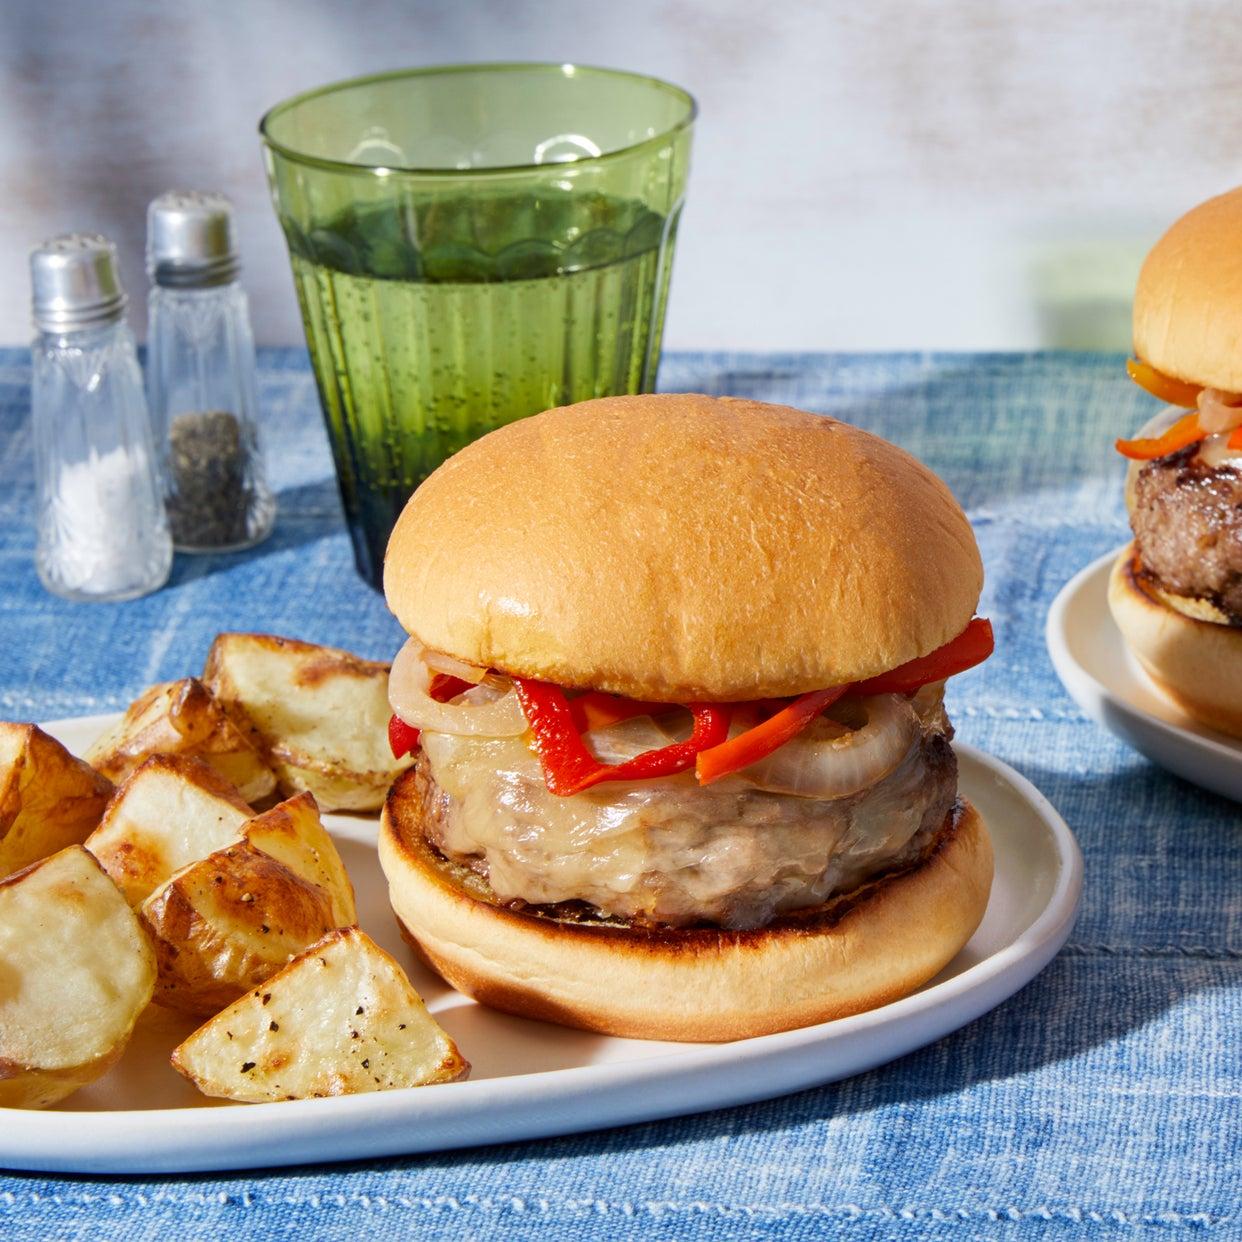 Pepper & Onion Cheeseburgers with Roasted Potatoes & Aioli